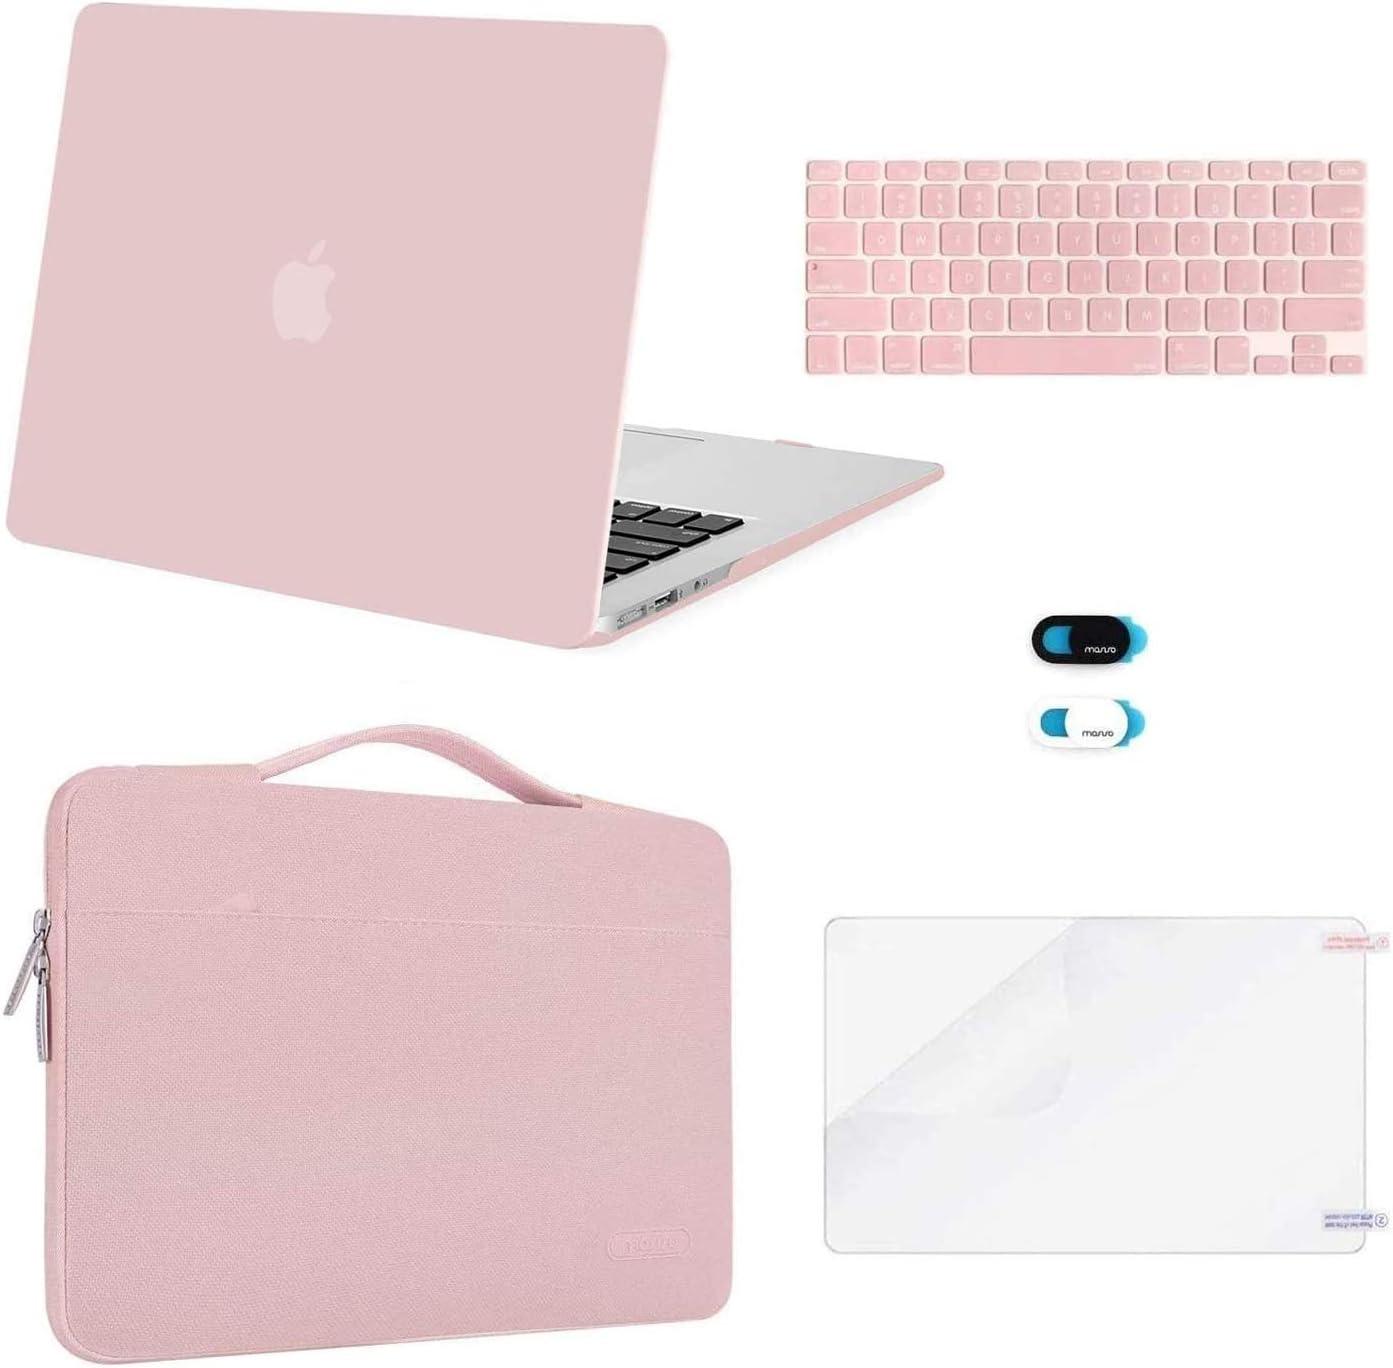 protección completa  MacBook Air 13 inch Case (A1369 A1466)